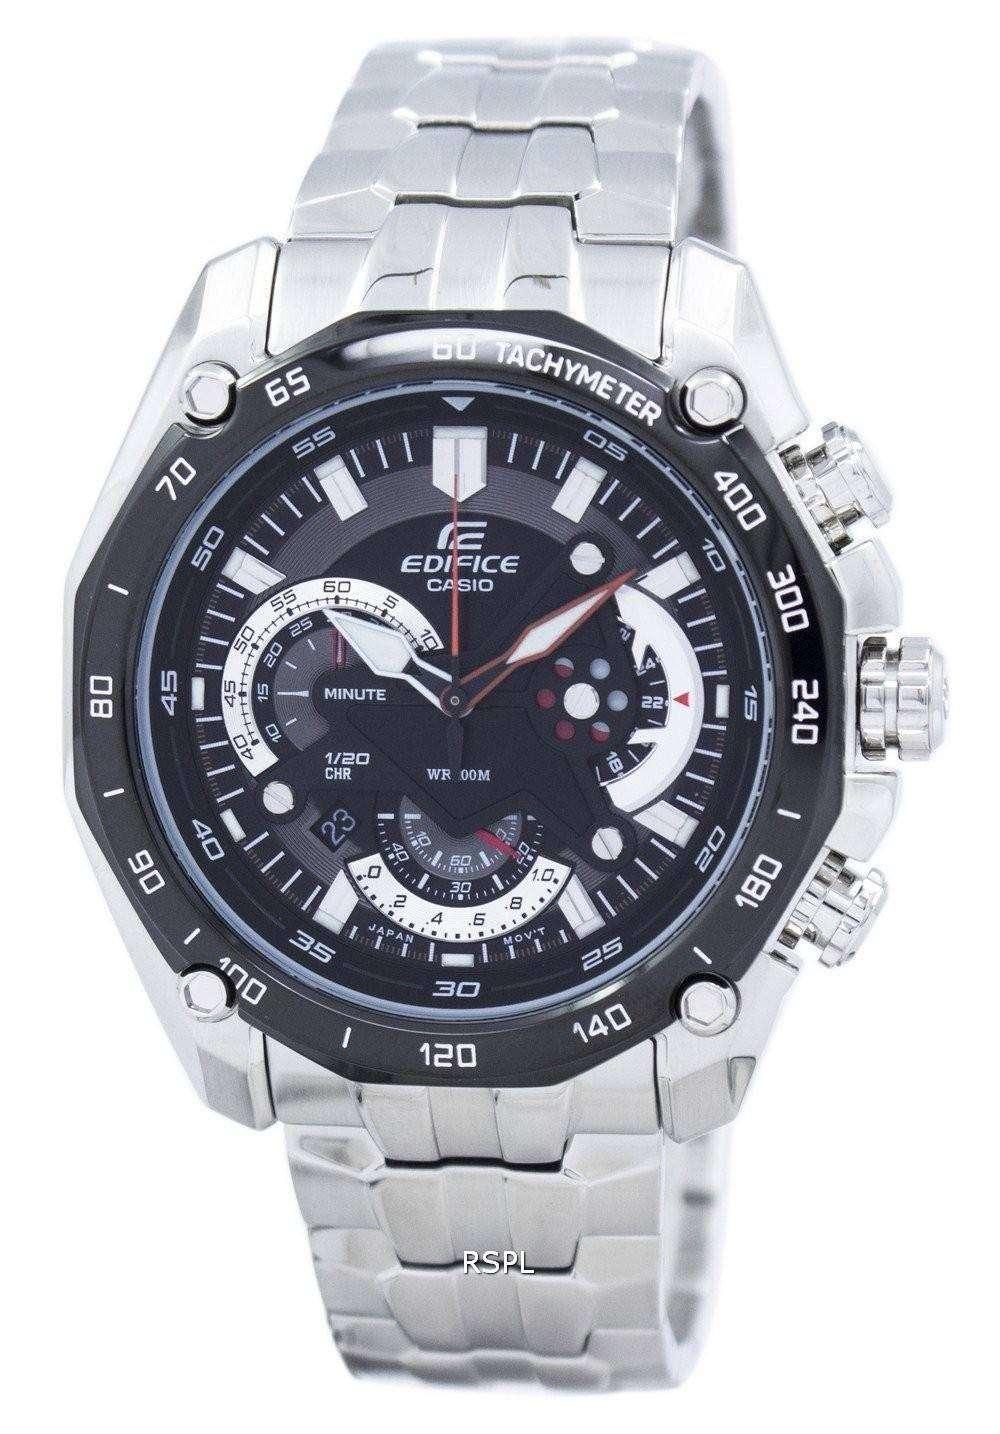 1 1avdf 550d Ef Casio Cronógrafo Reloj Edifice OlwTZukXPi